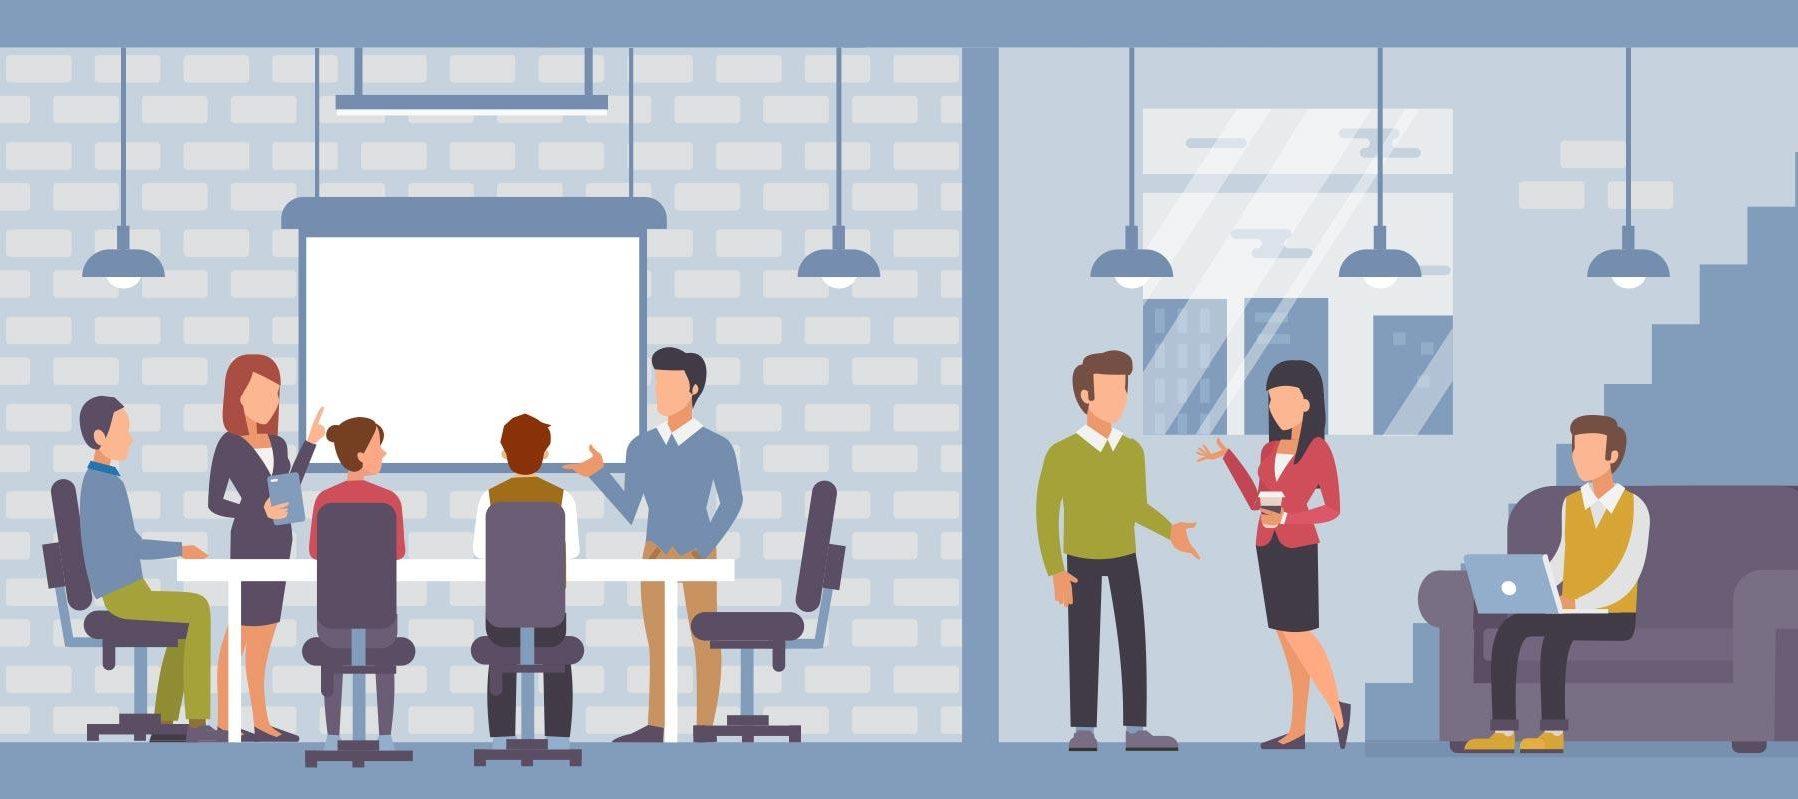 Development of ISO standard management systems - JLB Consultants